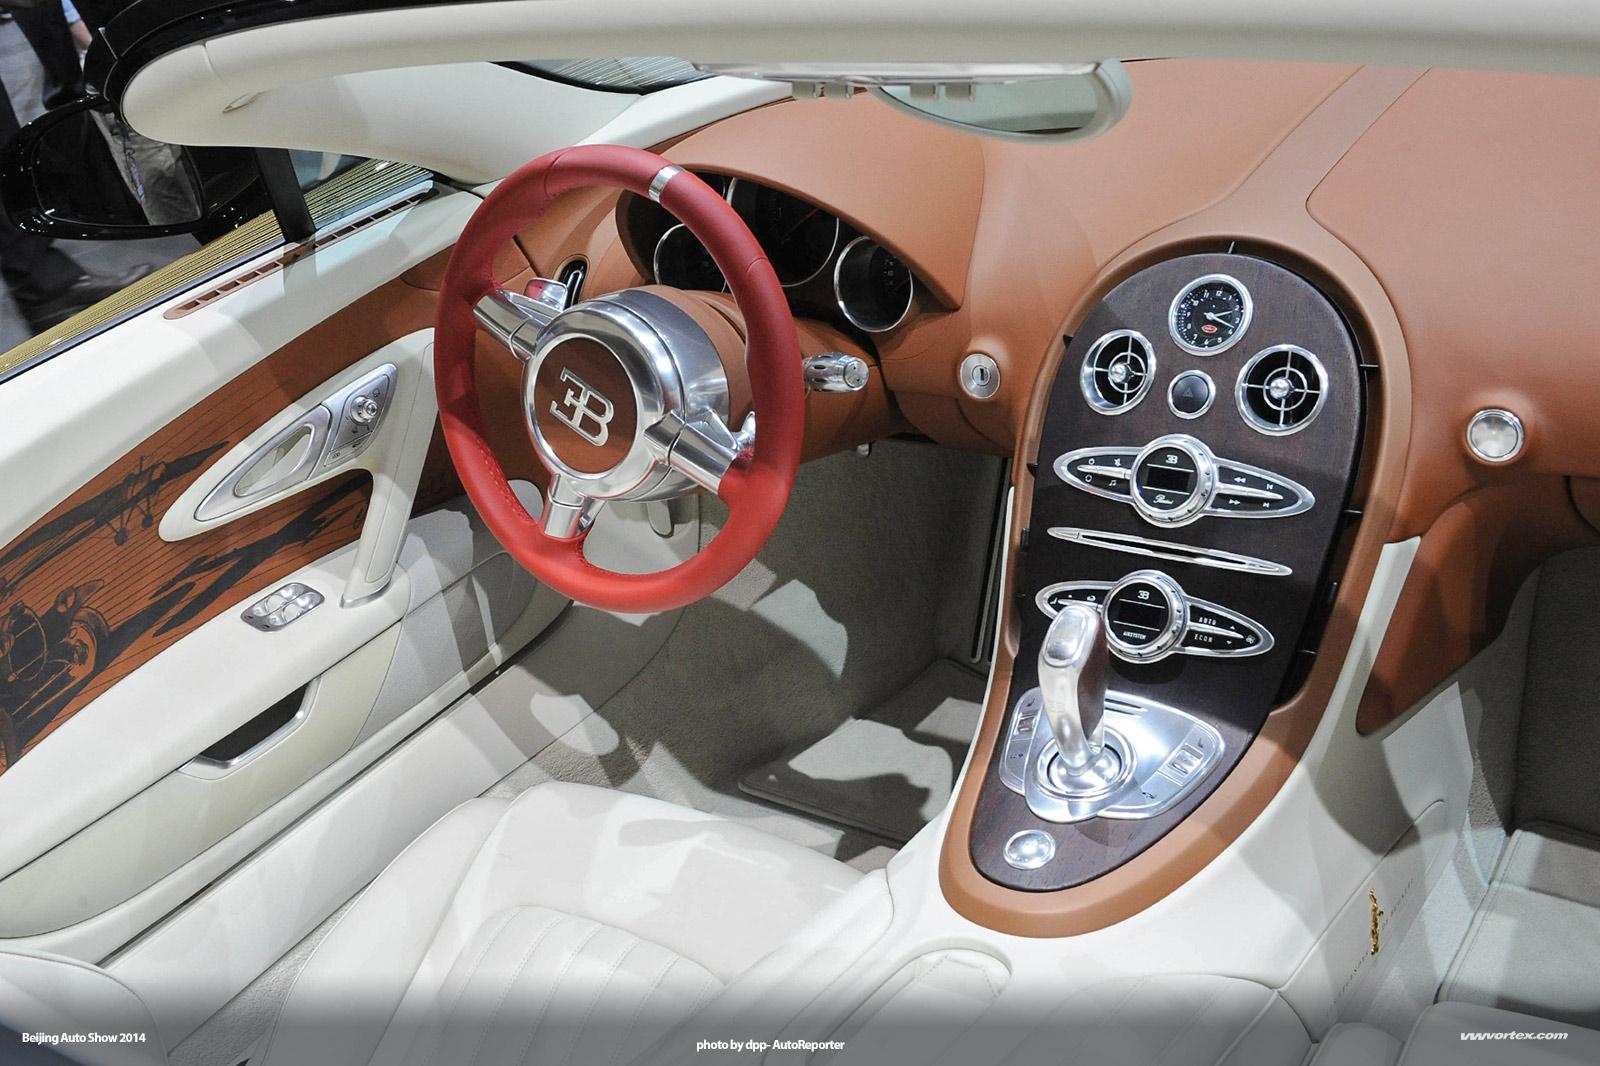 beijing-auto-show-2014-bugatti-364